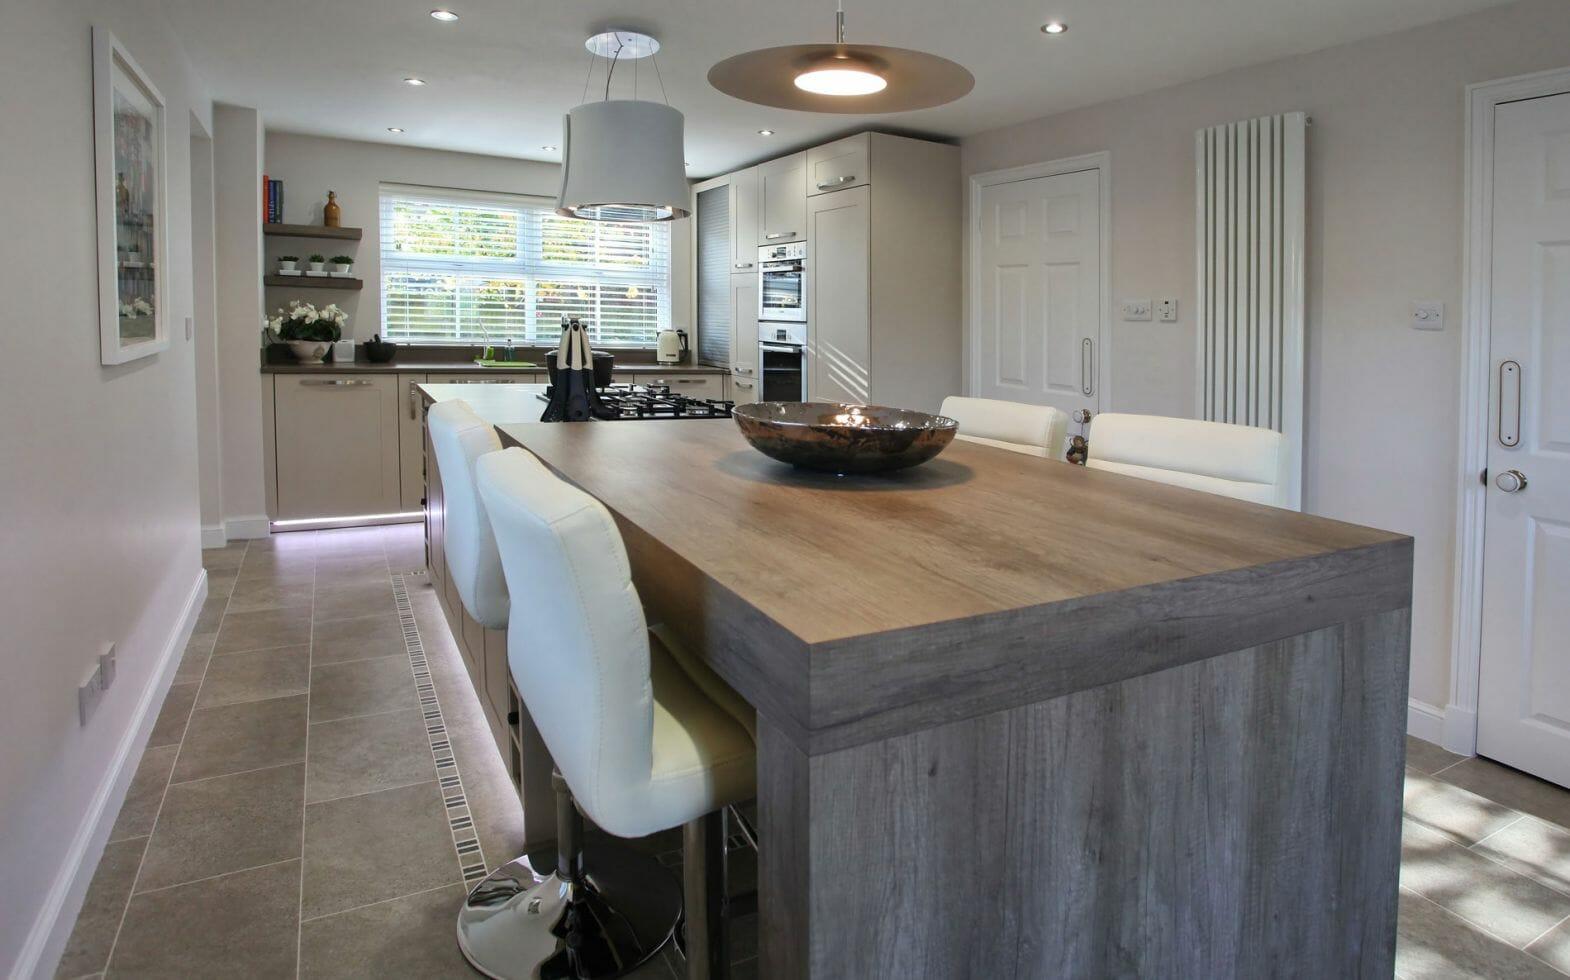 Kitchen example 4